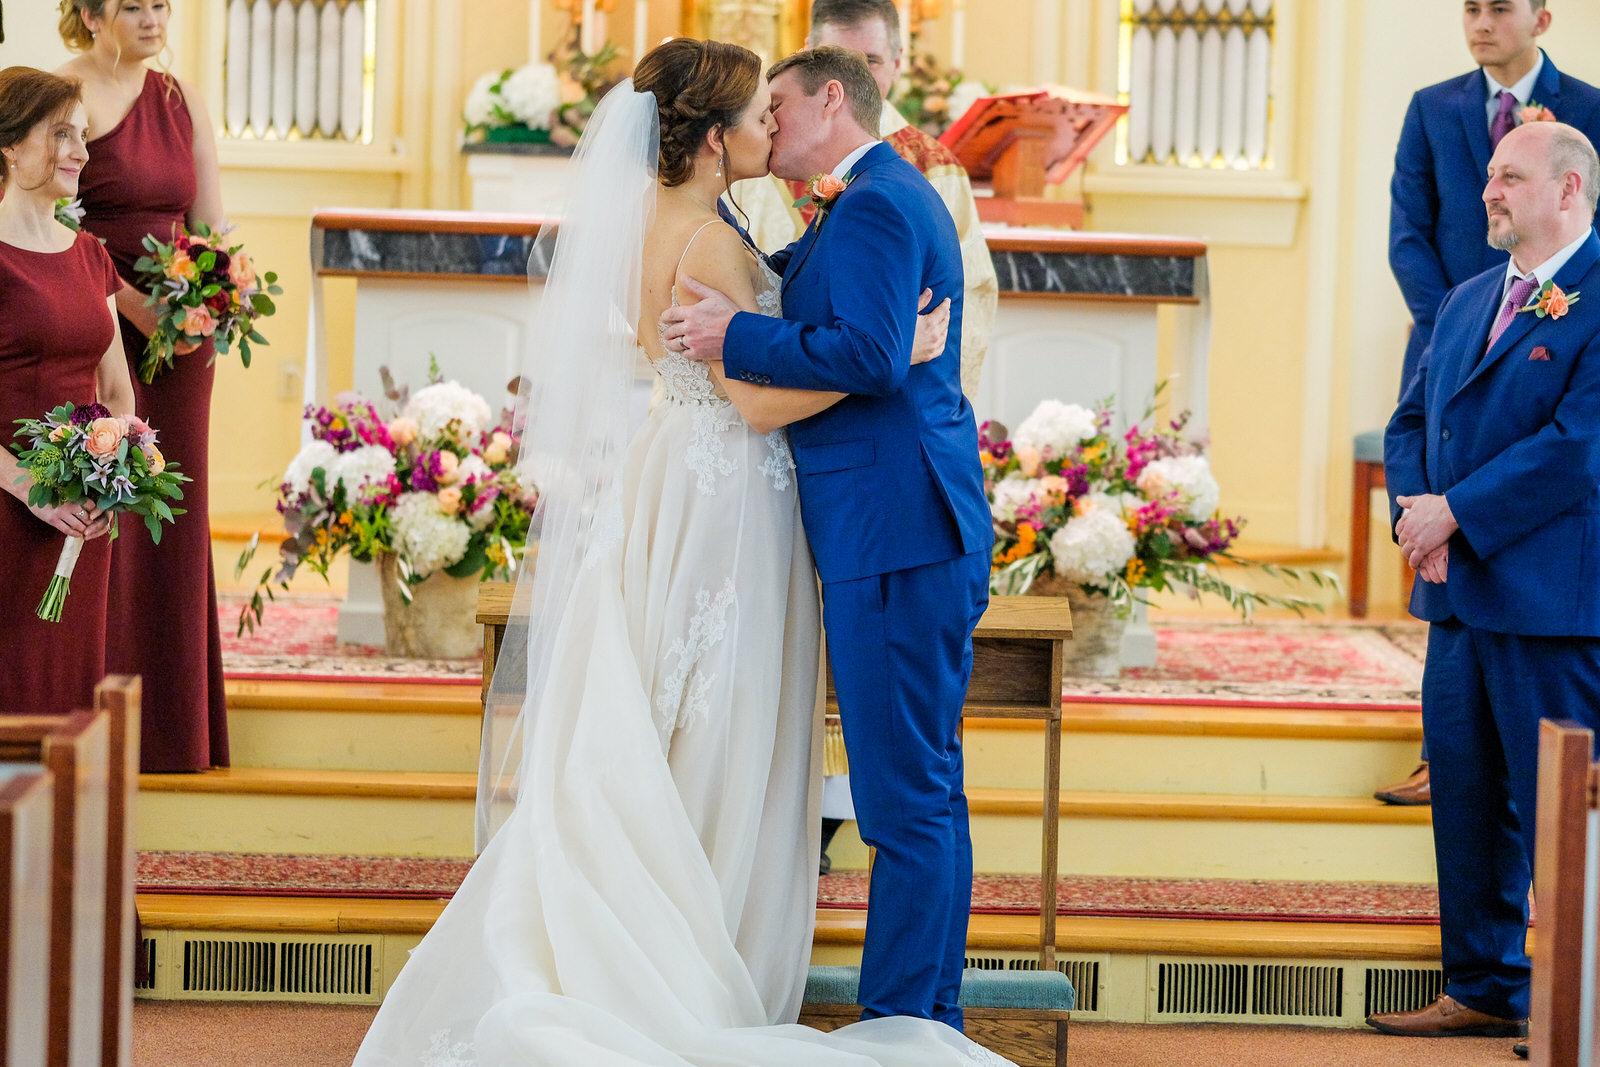 Zorvino-Vineyards-Fall-Wedding-Photography-360.jpg